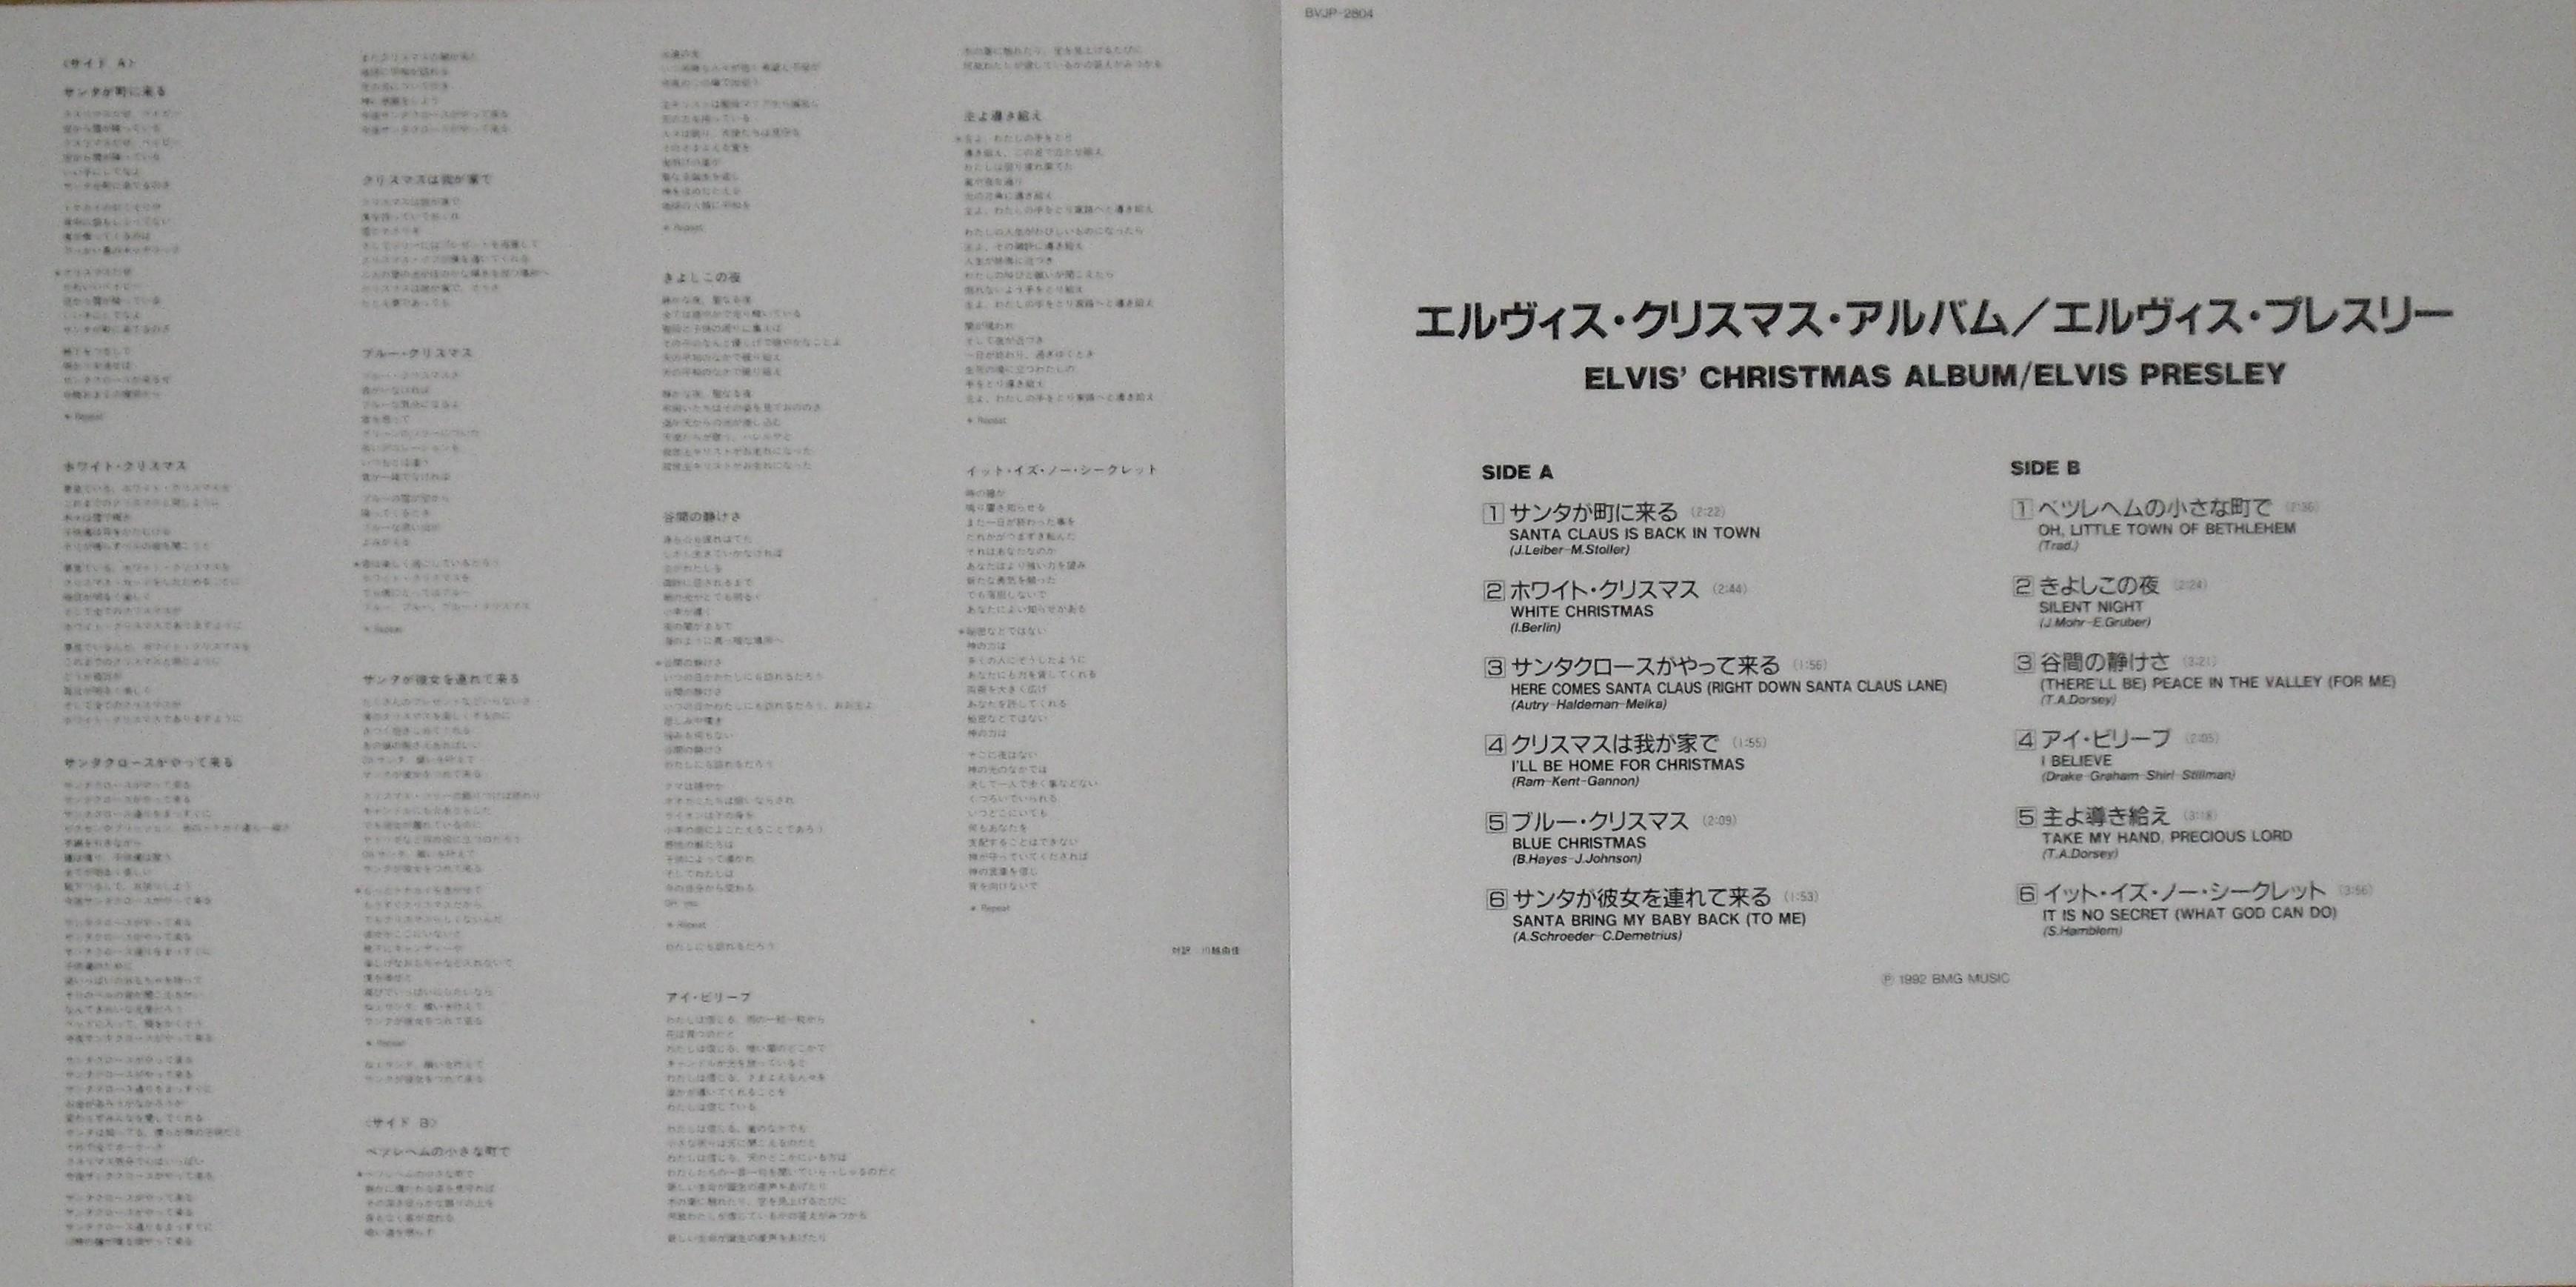 ELVIS' CHRISTMAS ALBUM 06qscnm